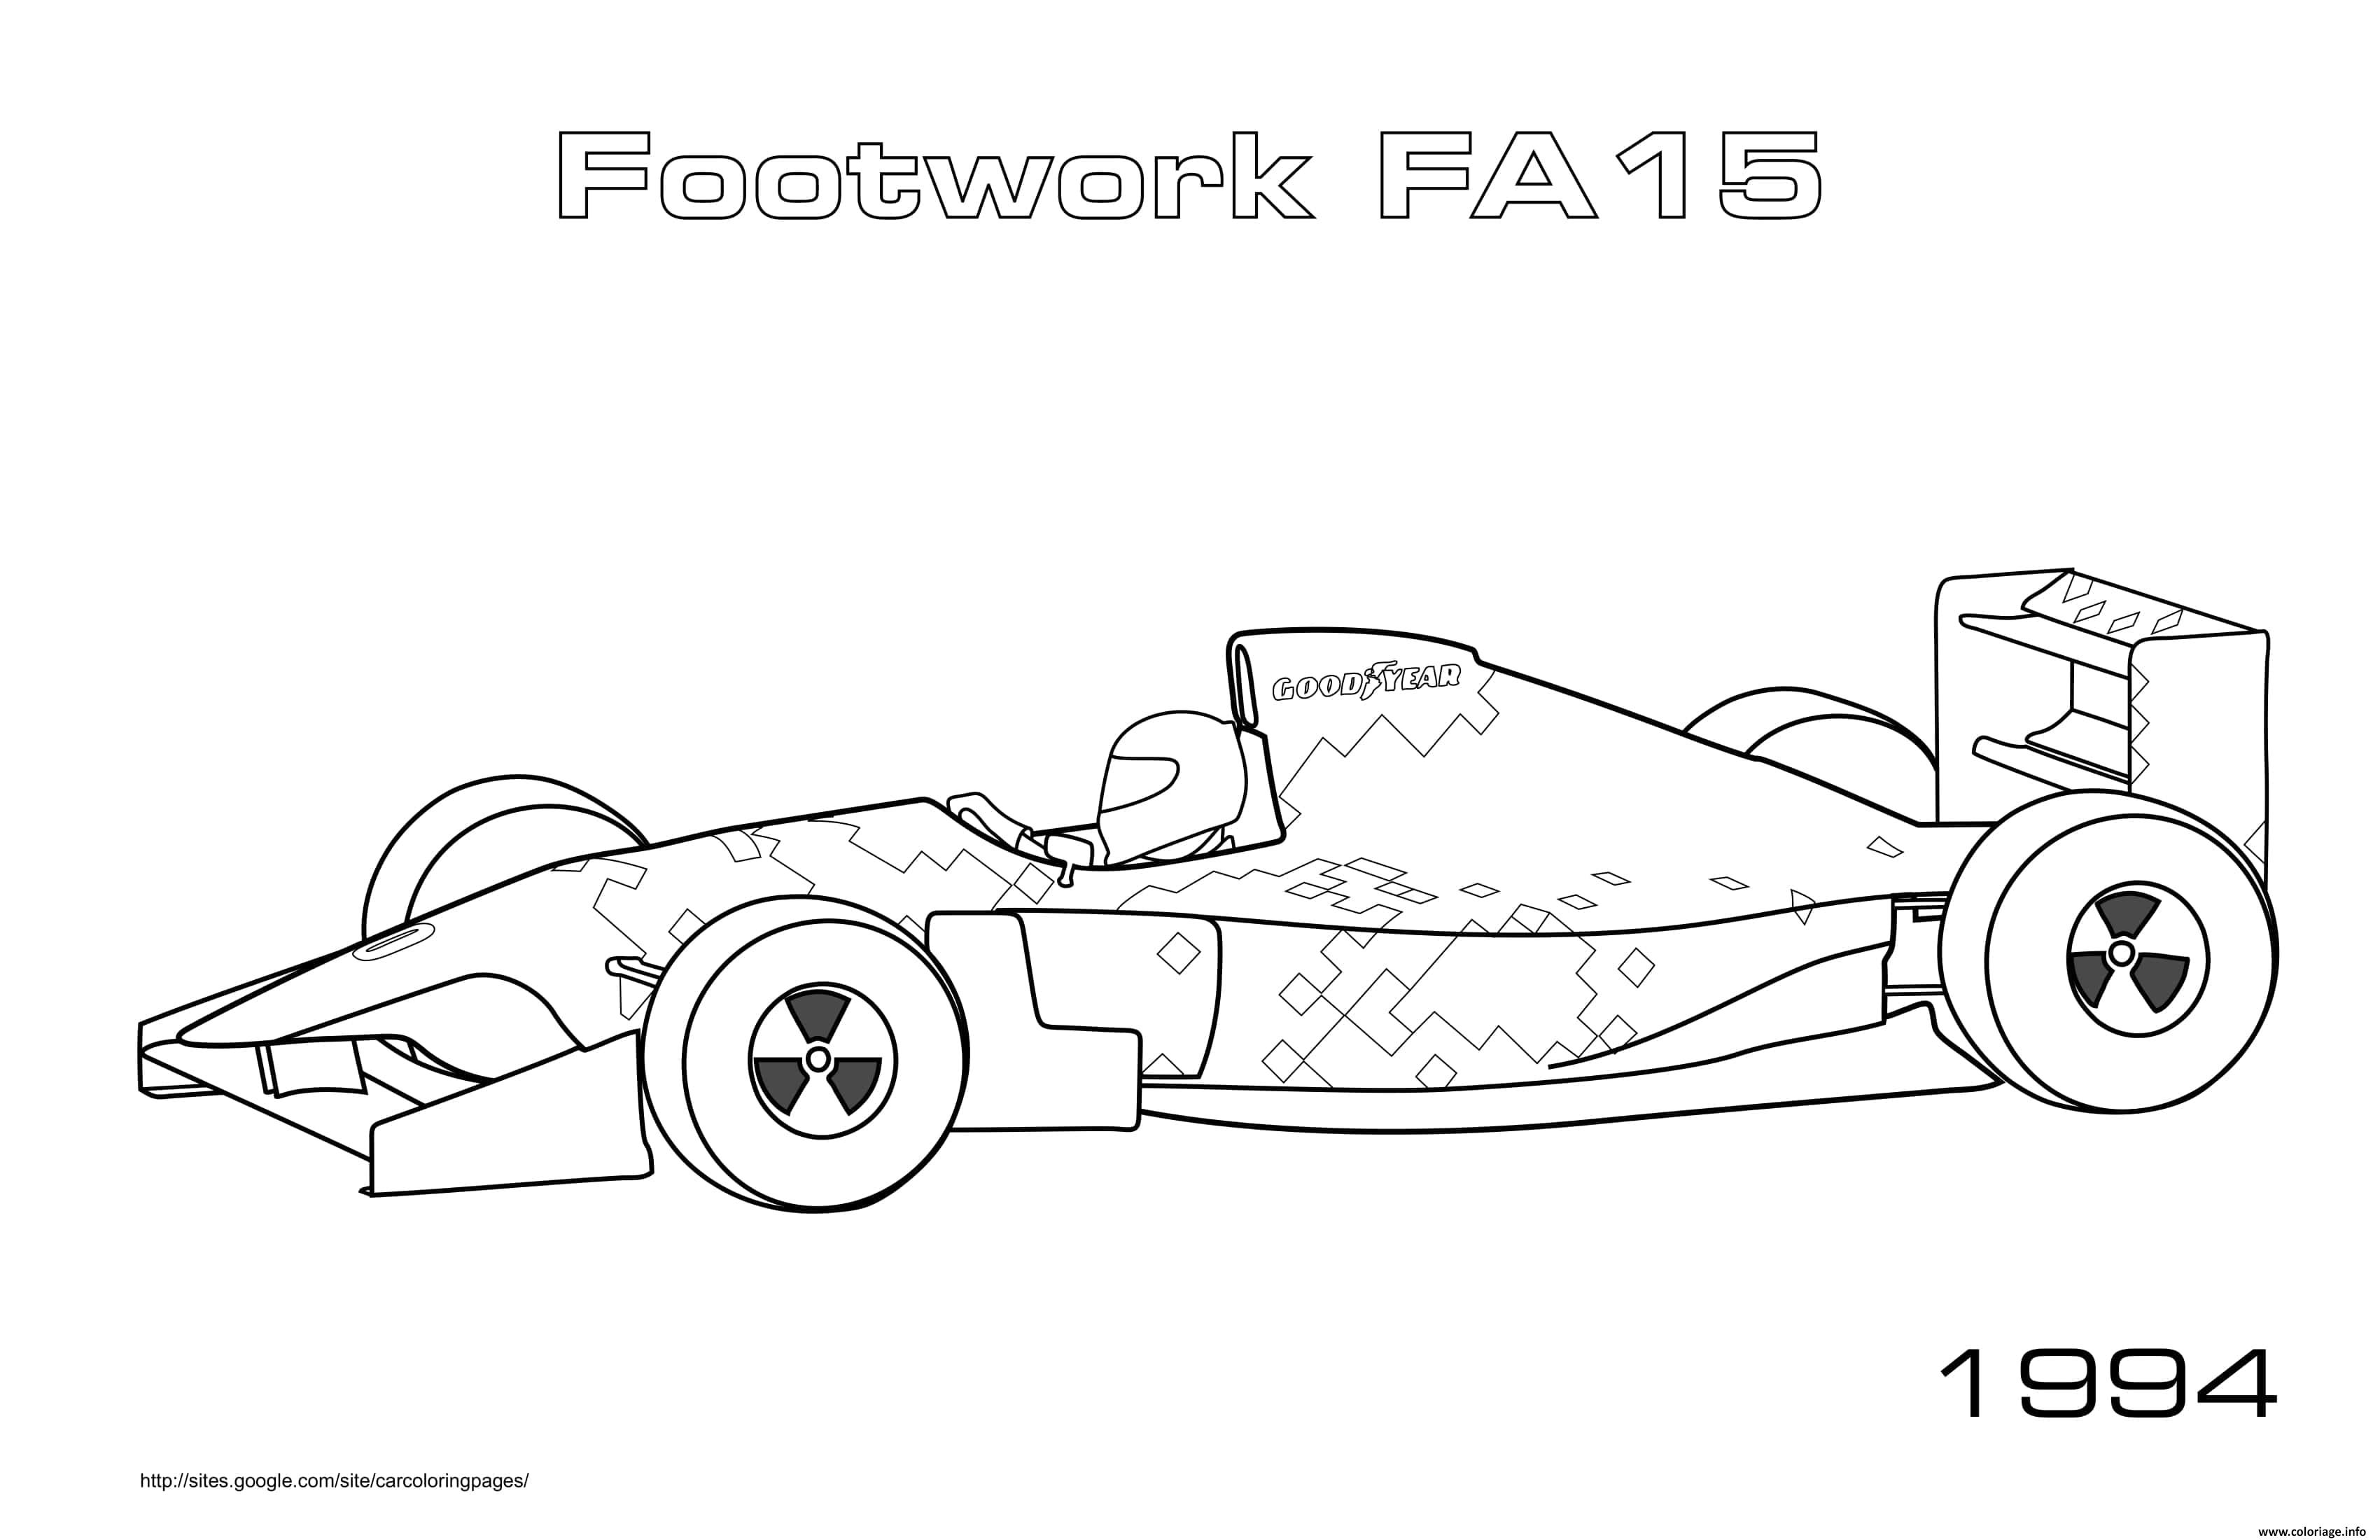 Dessin F1 Footwork Fa15 1994 Coloriage Gratuit à Imprimer